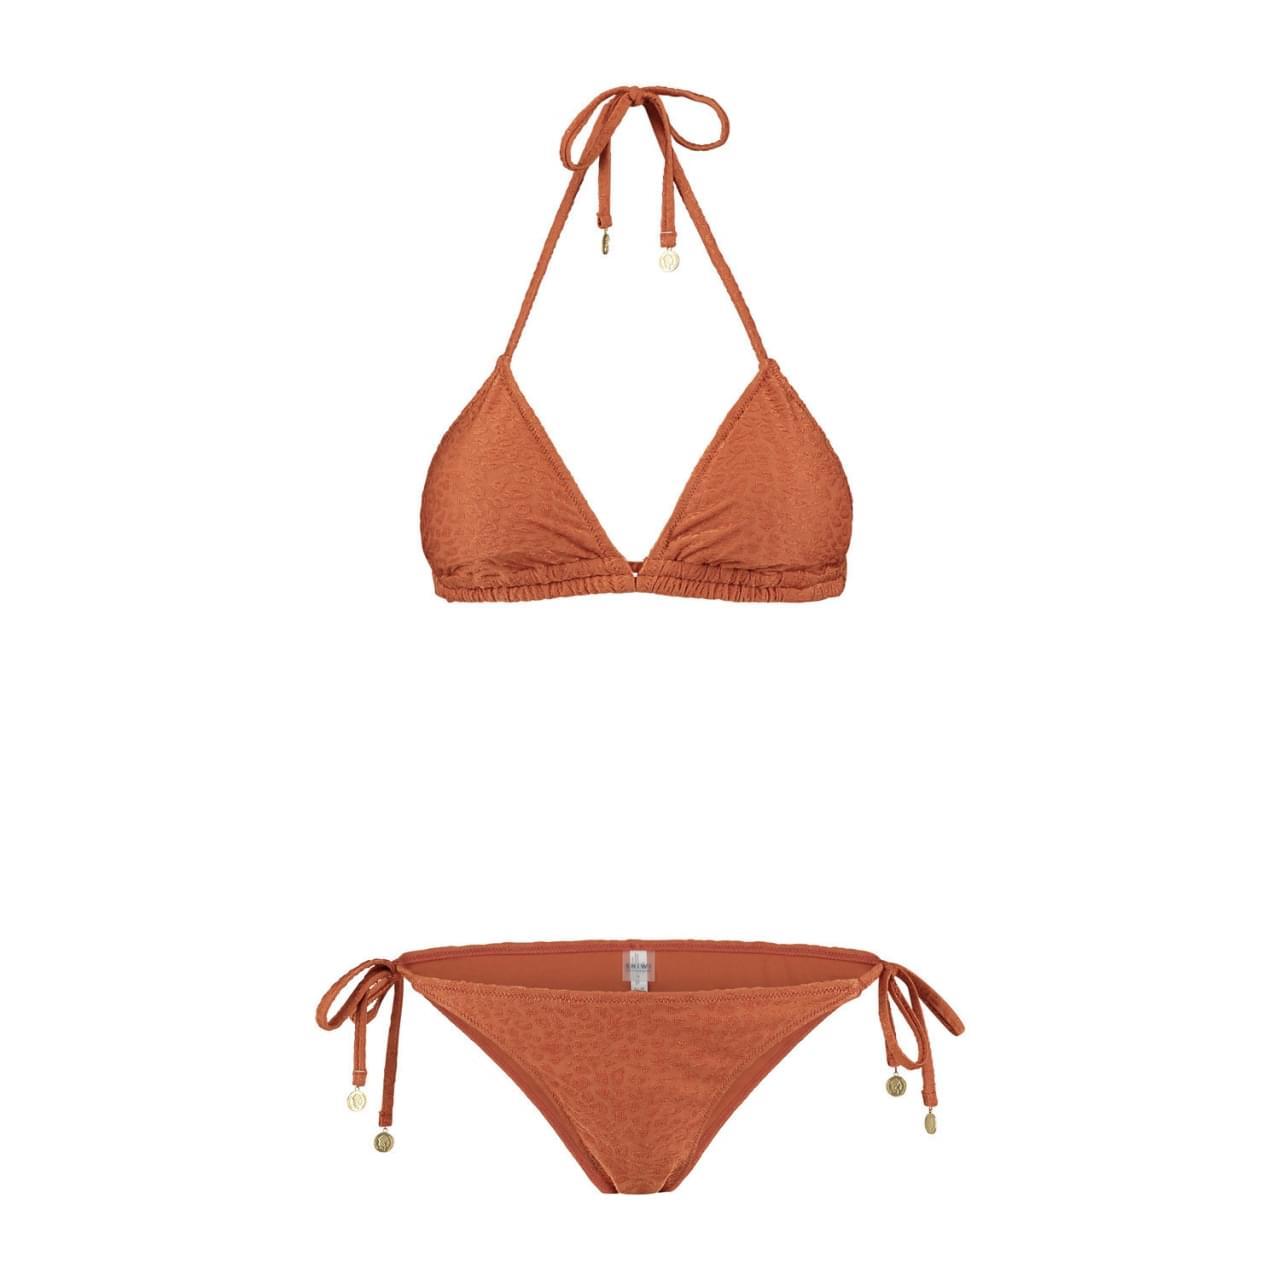 SHIWI Textured Leopard Triangle Bikini Dames Bruin